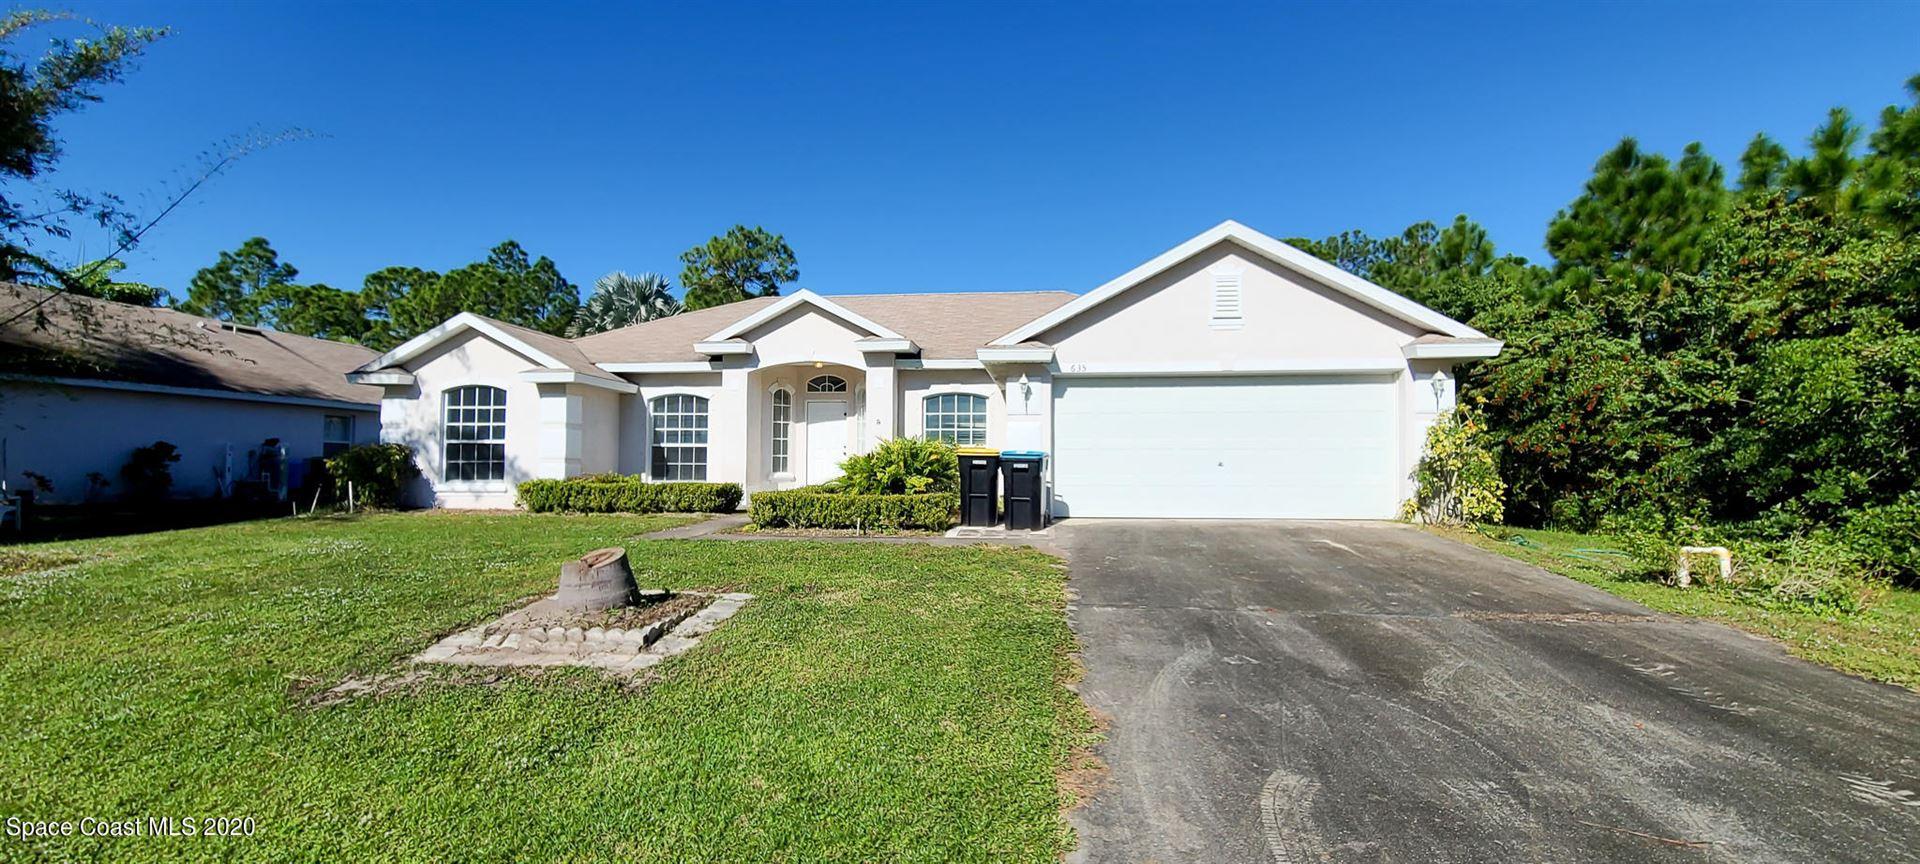 635 SE Flynn Street, Palm Bay, FL 32909 - #: 892043